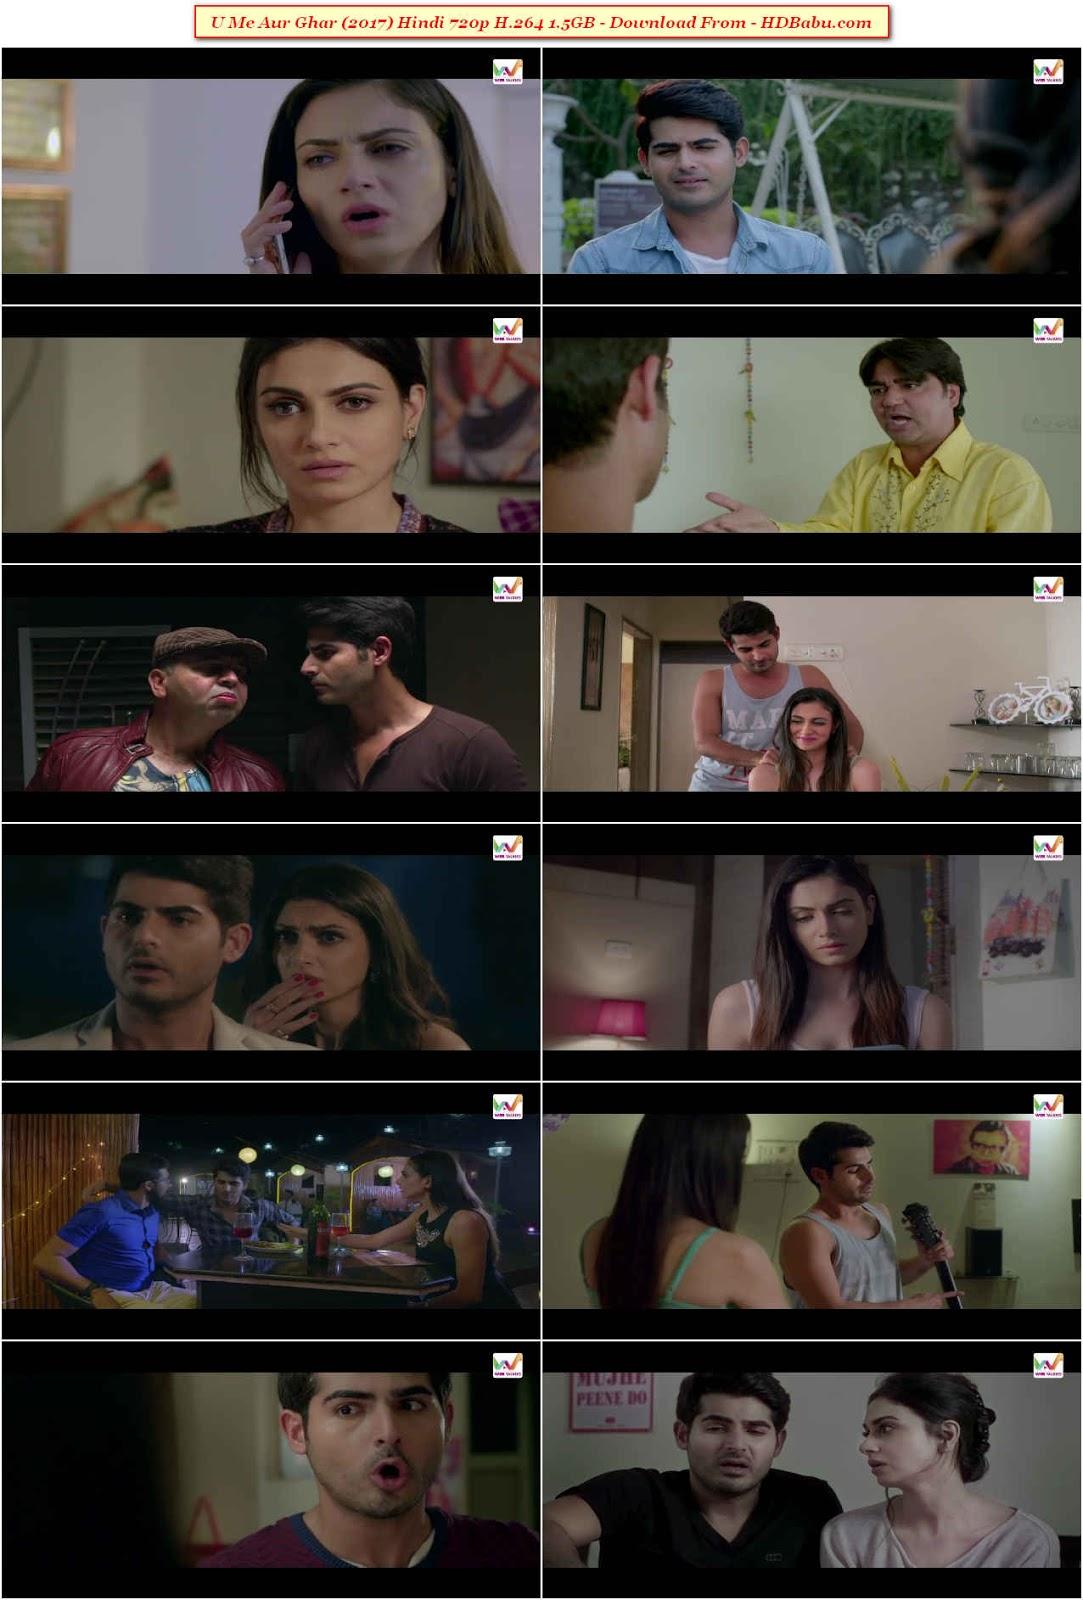 U Me Aur Ghar Full Movie Download